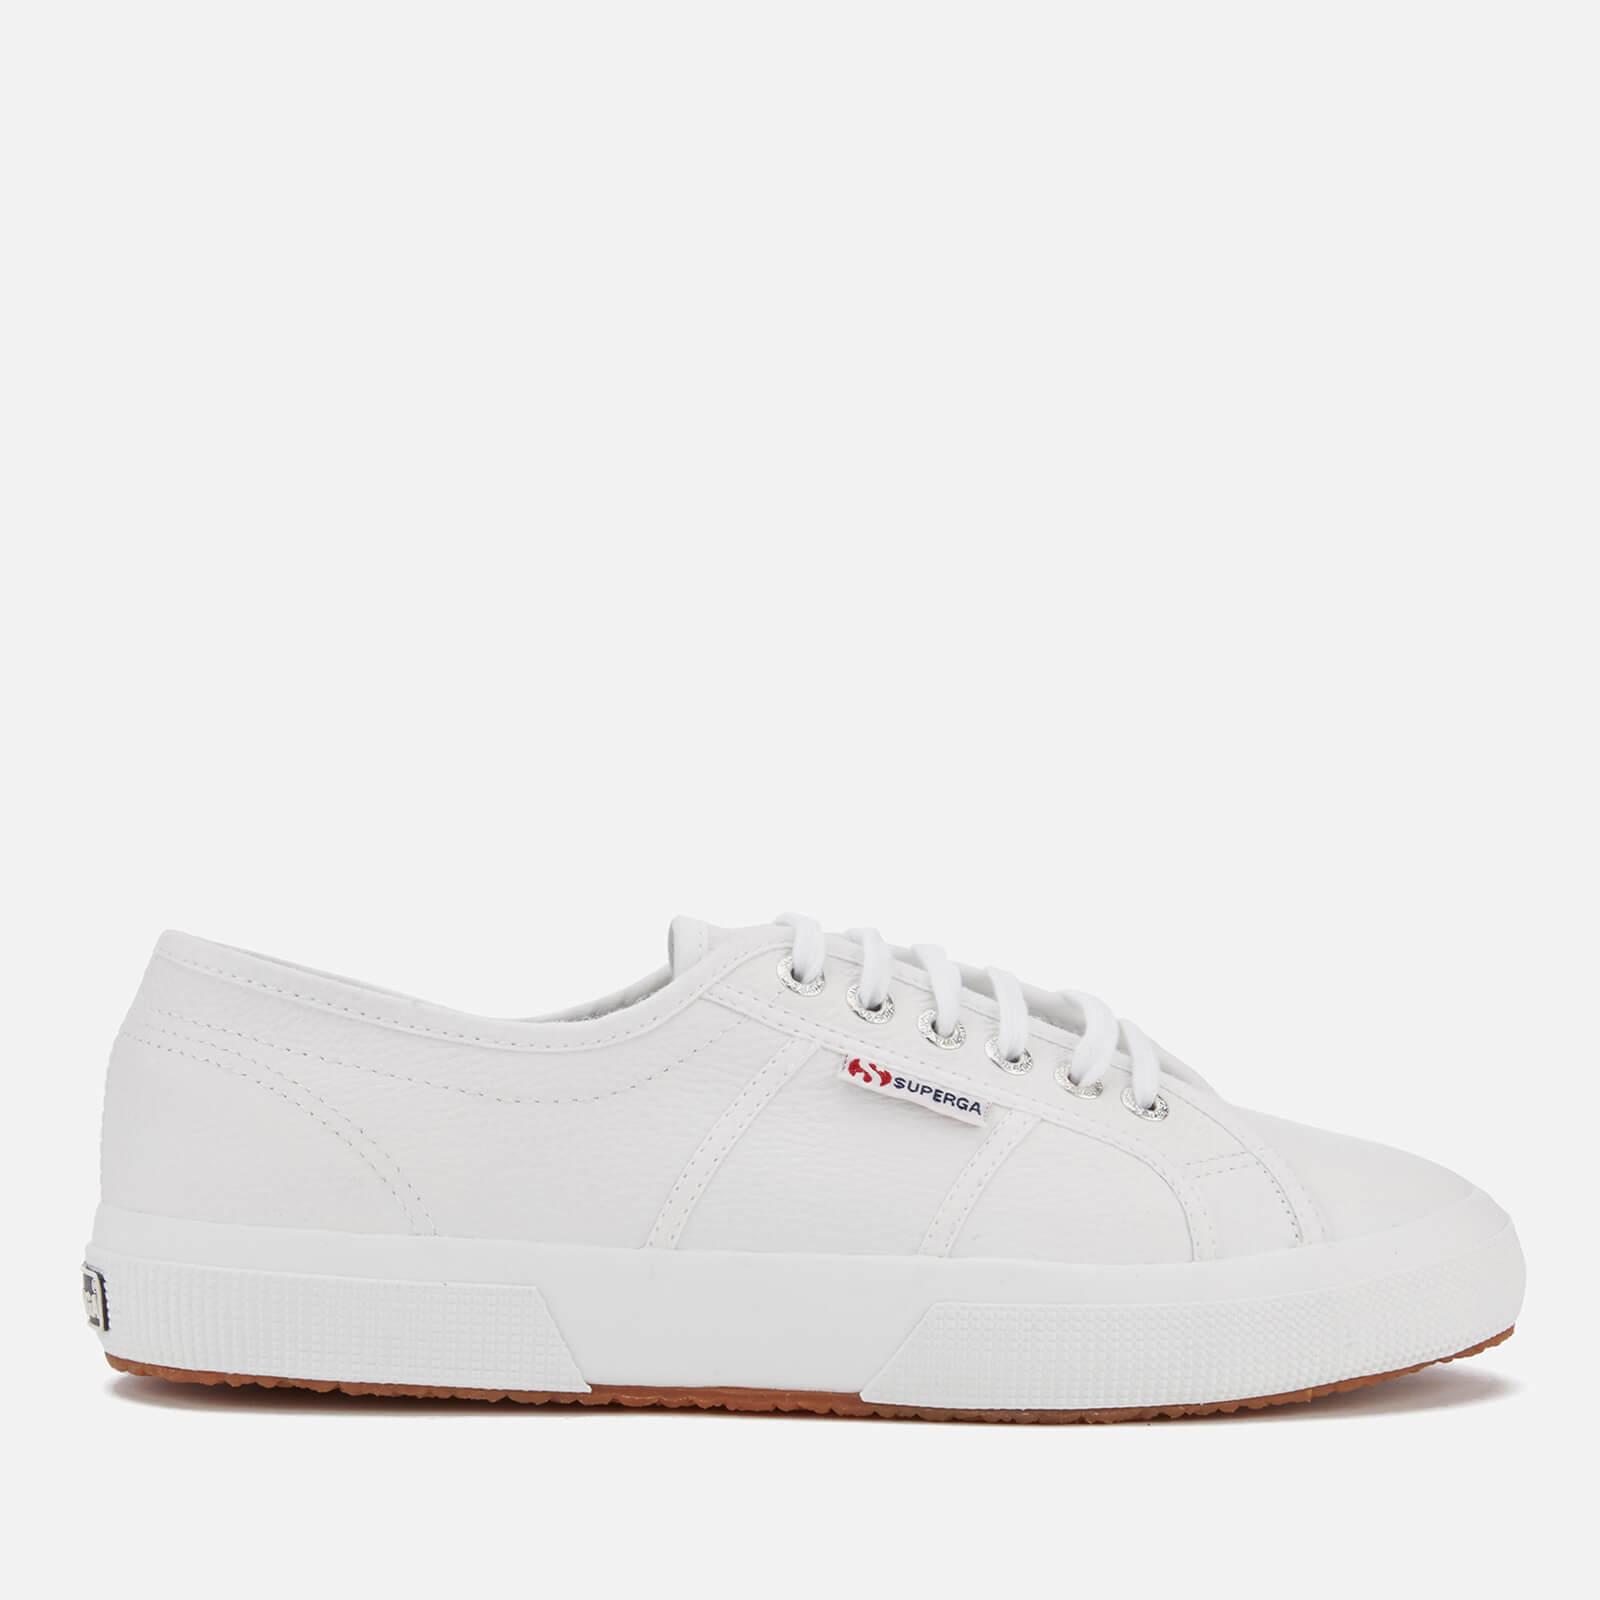 Superga 2750 Fglu Leather Trainers - White - UK 10 - White